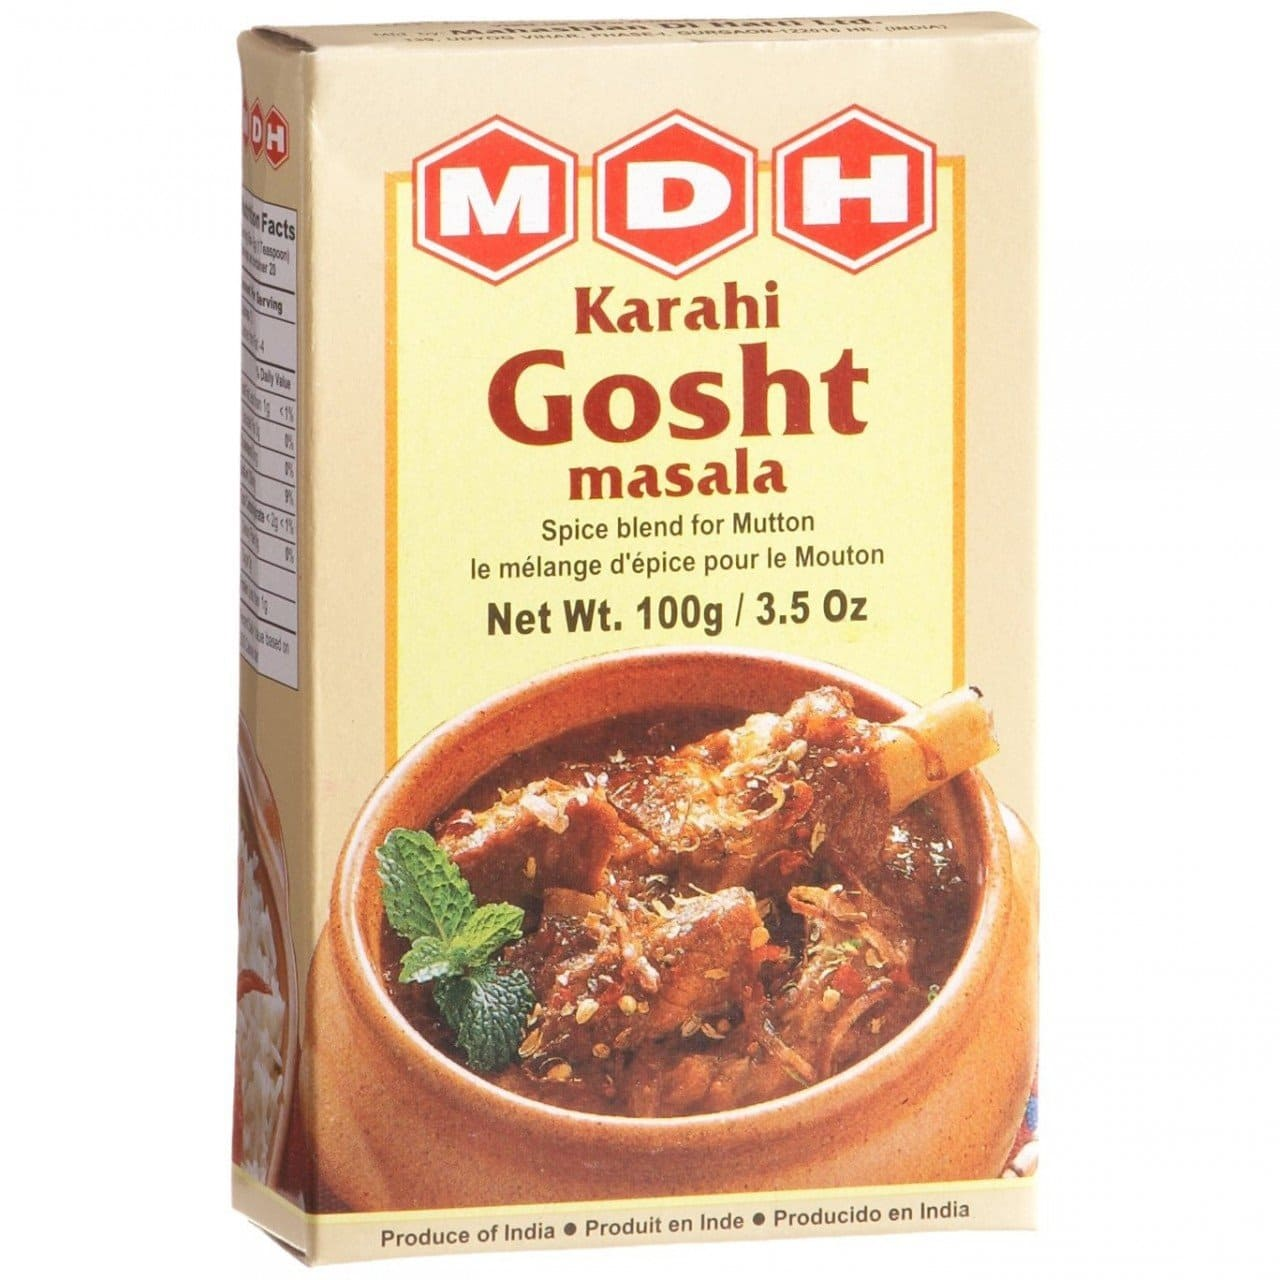 Karahi Gosht Masala 100Gm by MDH Brand